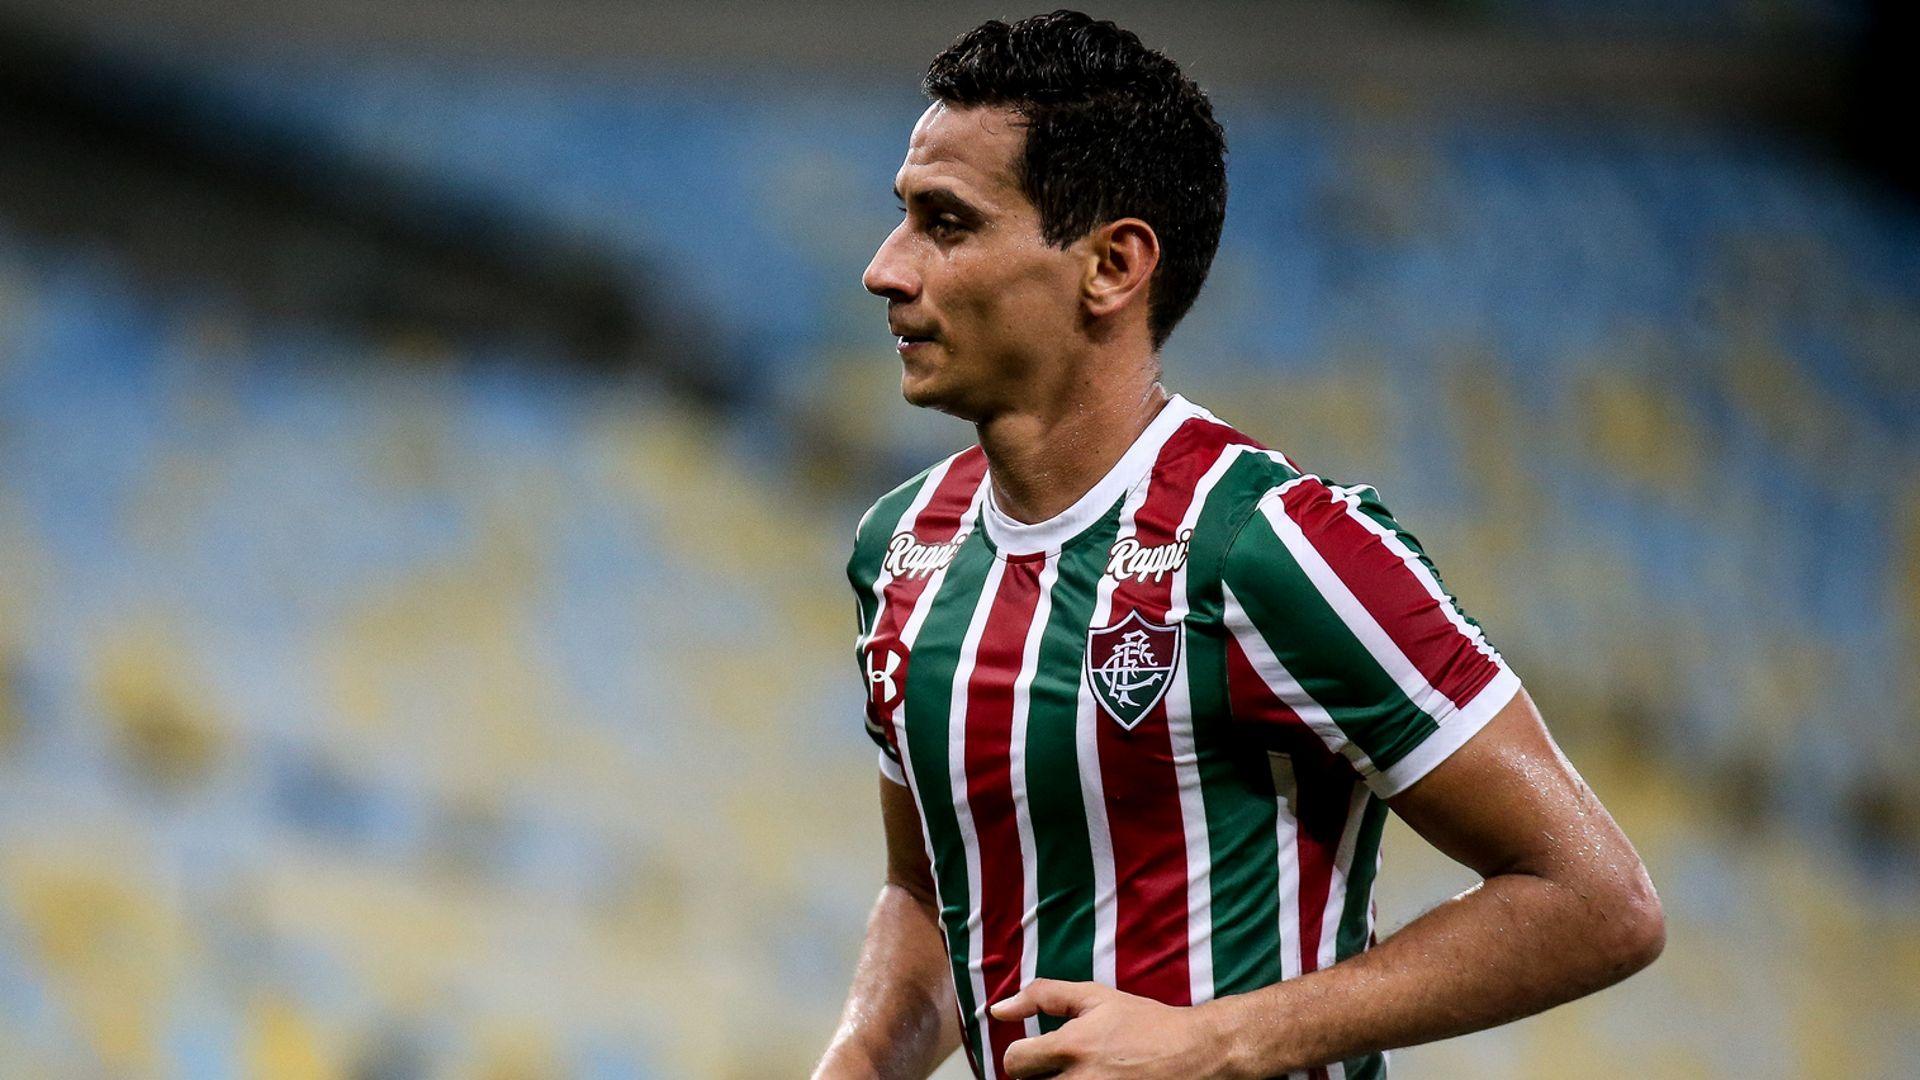 Ganso Fluminense 2019